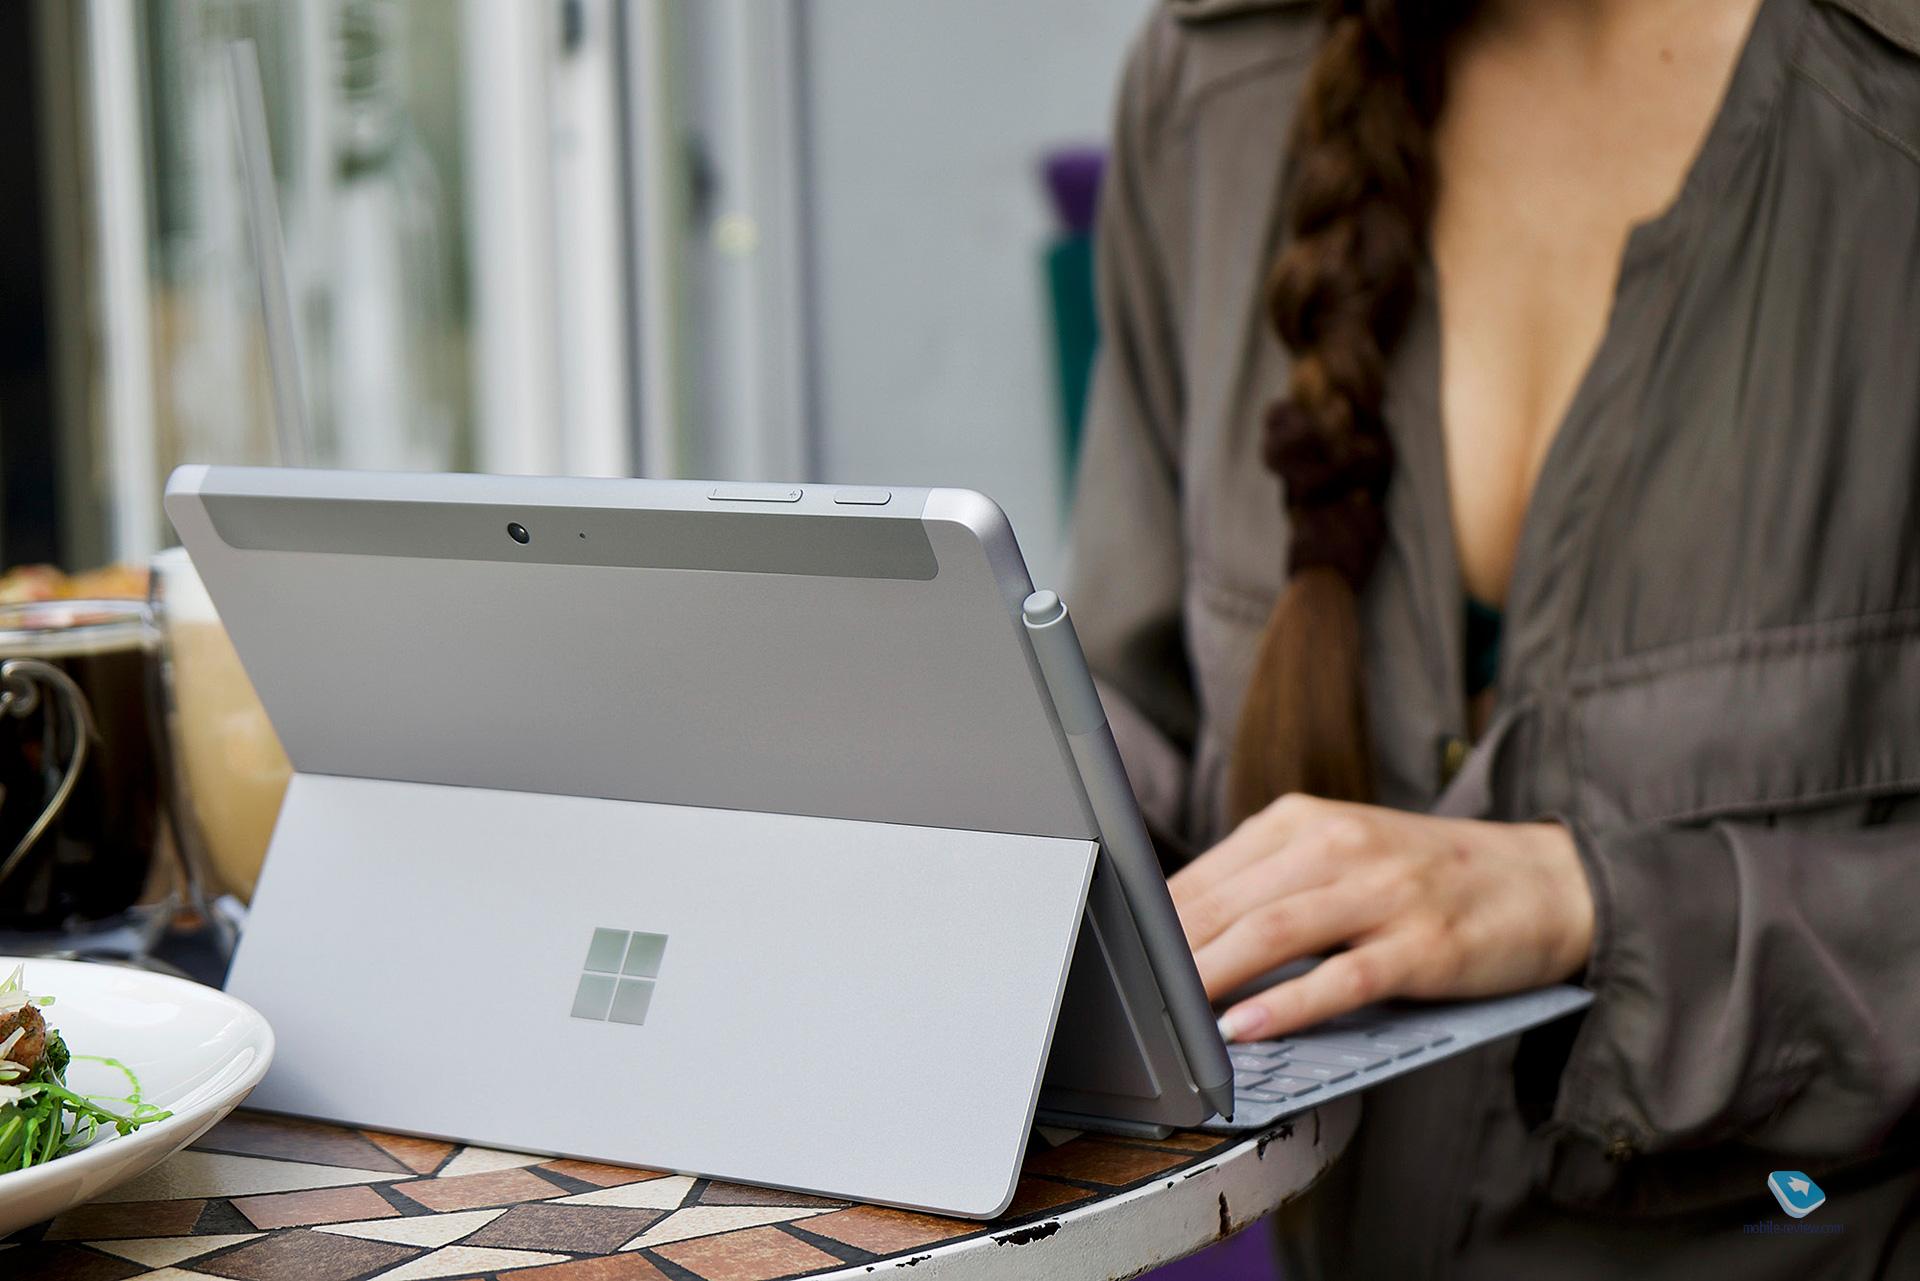 Mobile-review com Обзор Windows-планшета или компьютера два